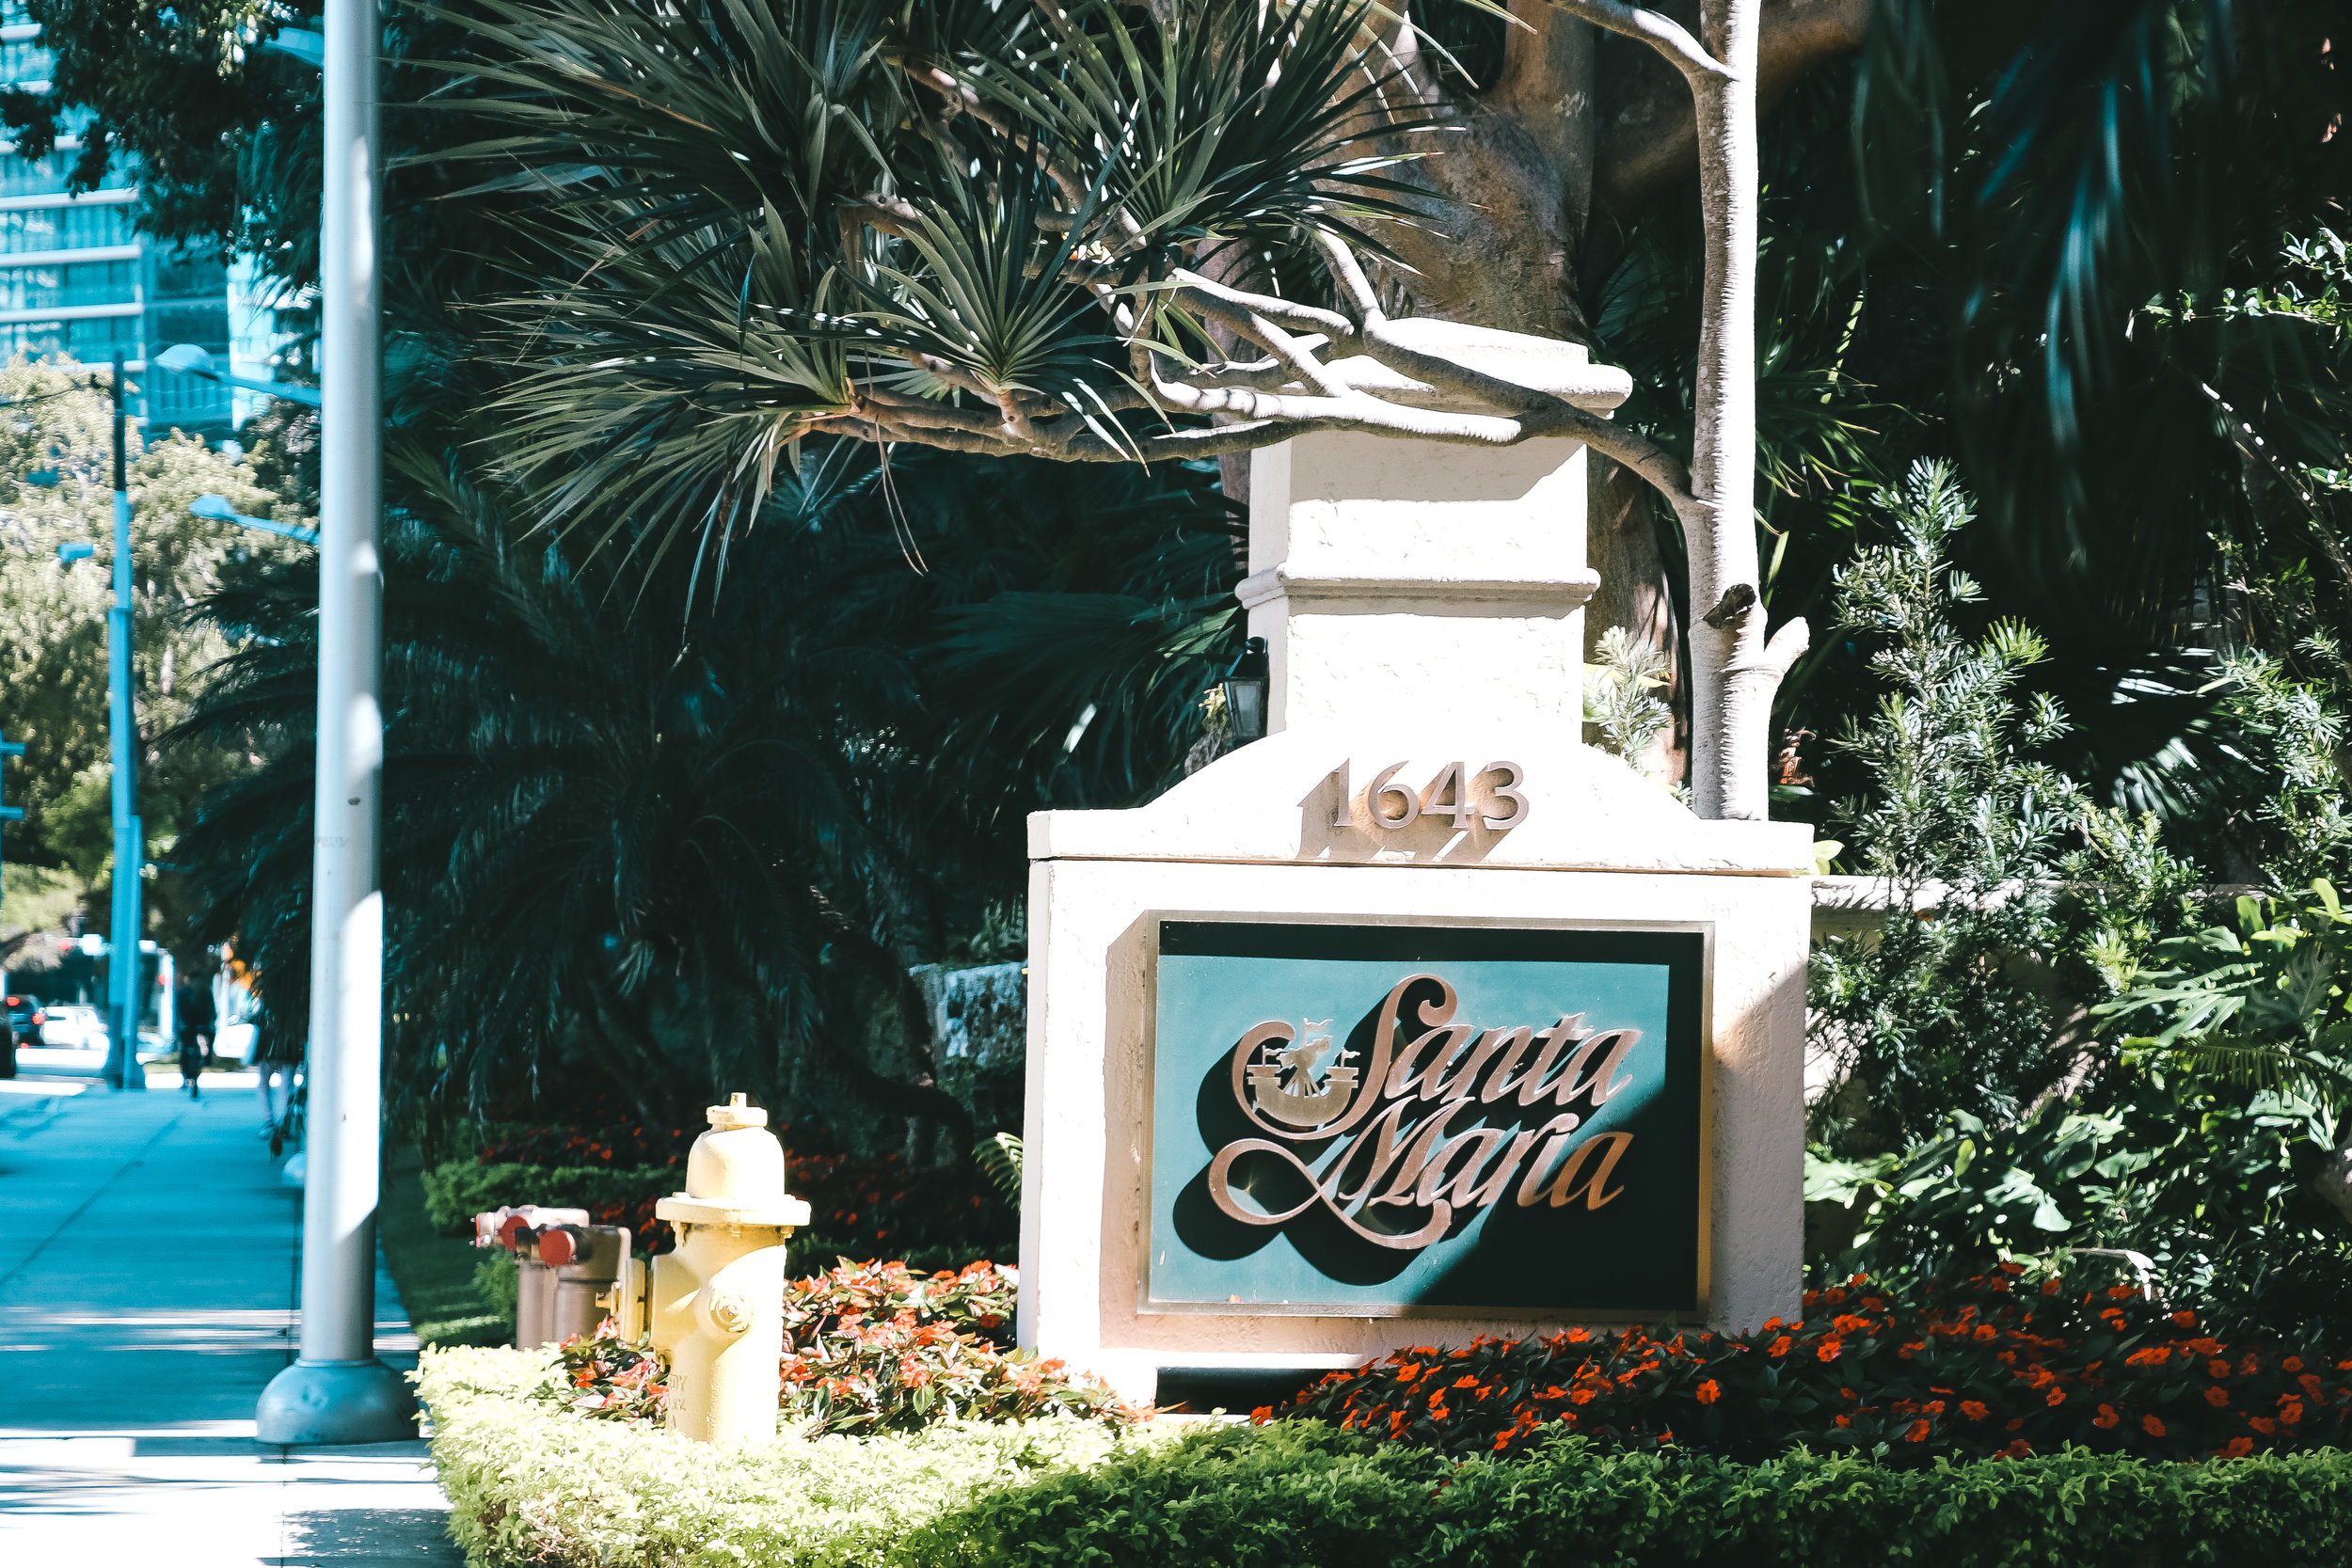 Santa Maria - Address: 1643 Brickell Avenue, Miami, FL 33129Number of Units: 174Info: Michael Harned